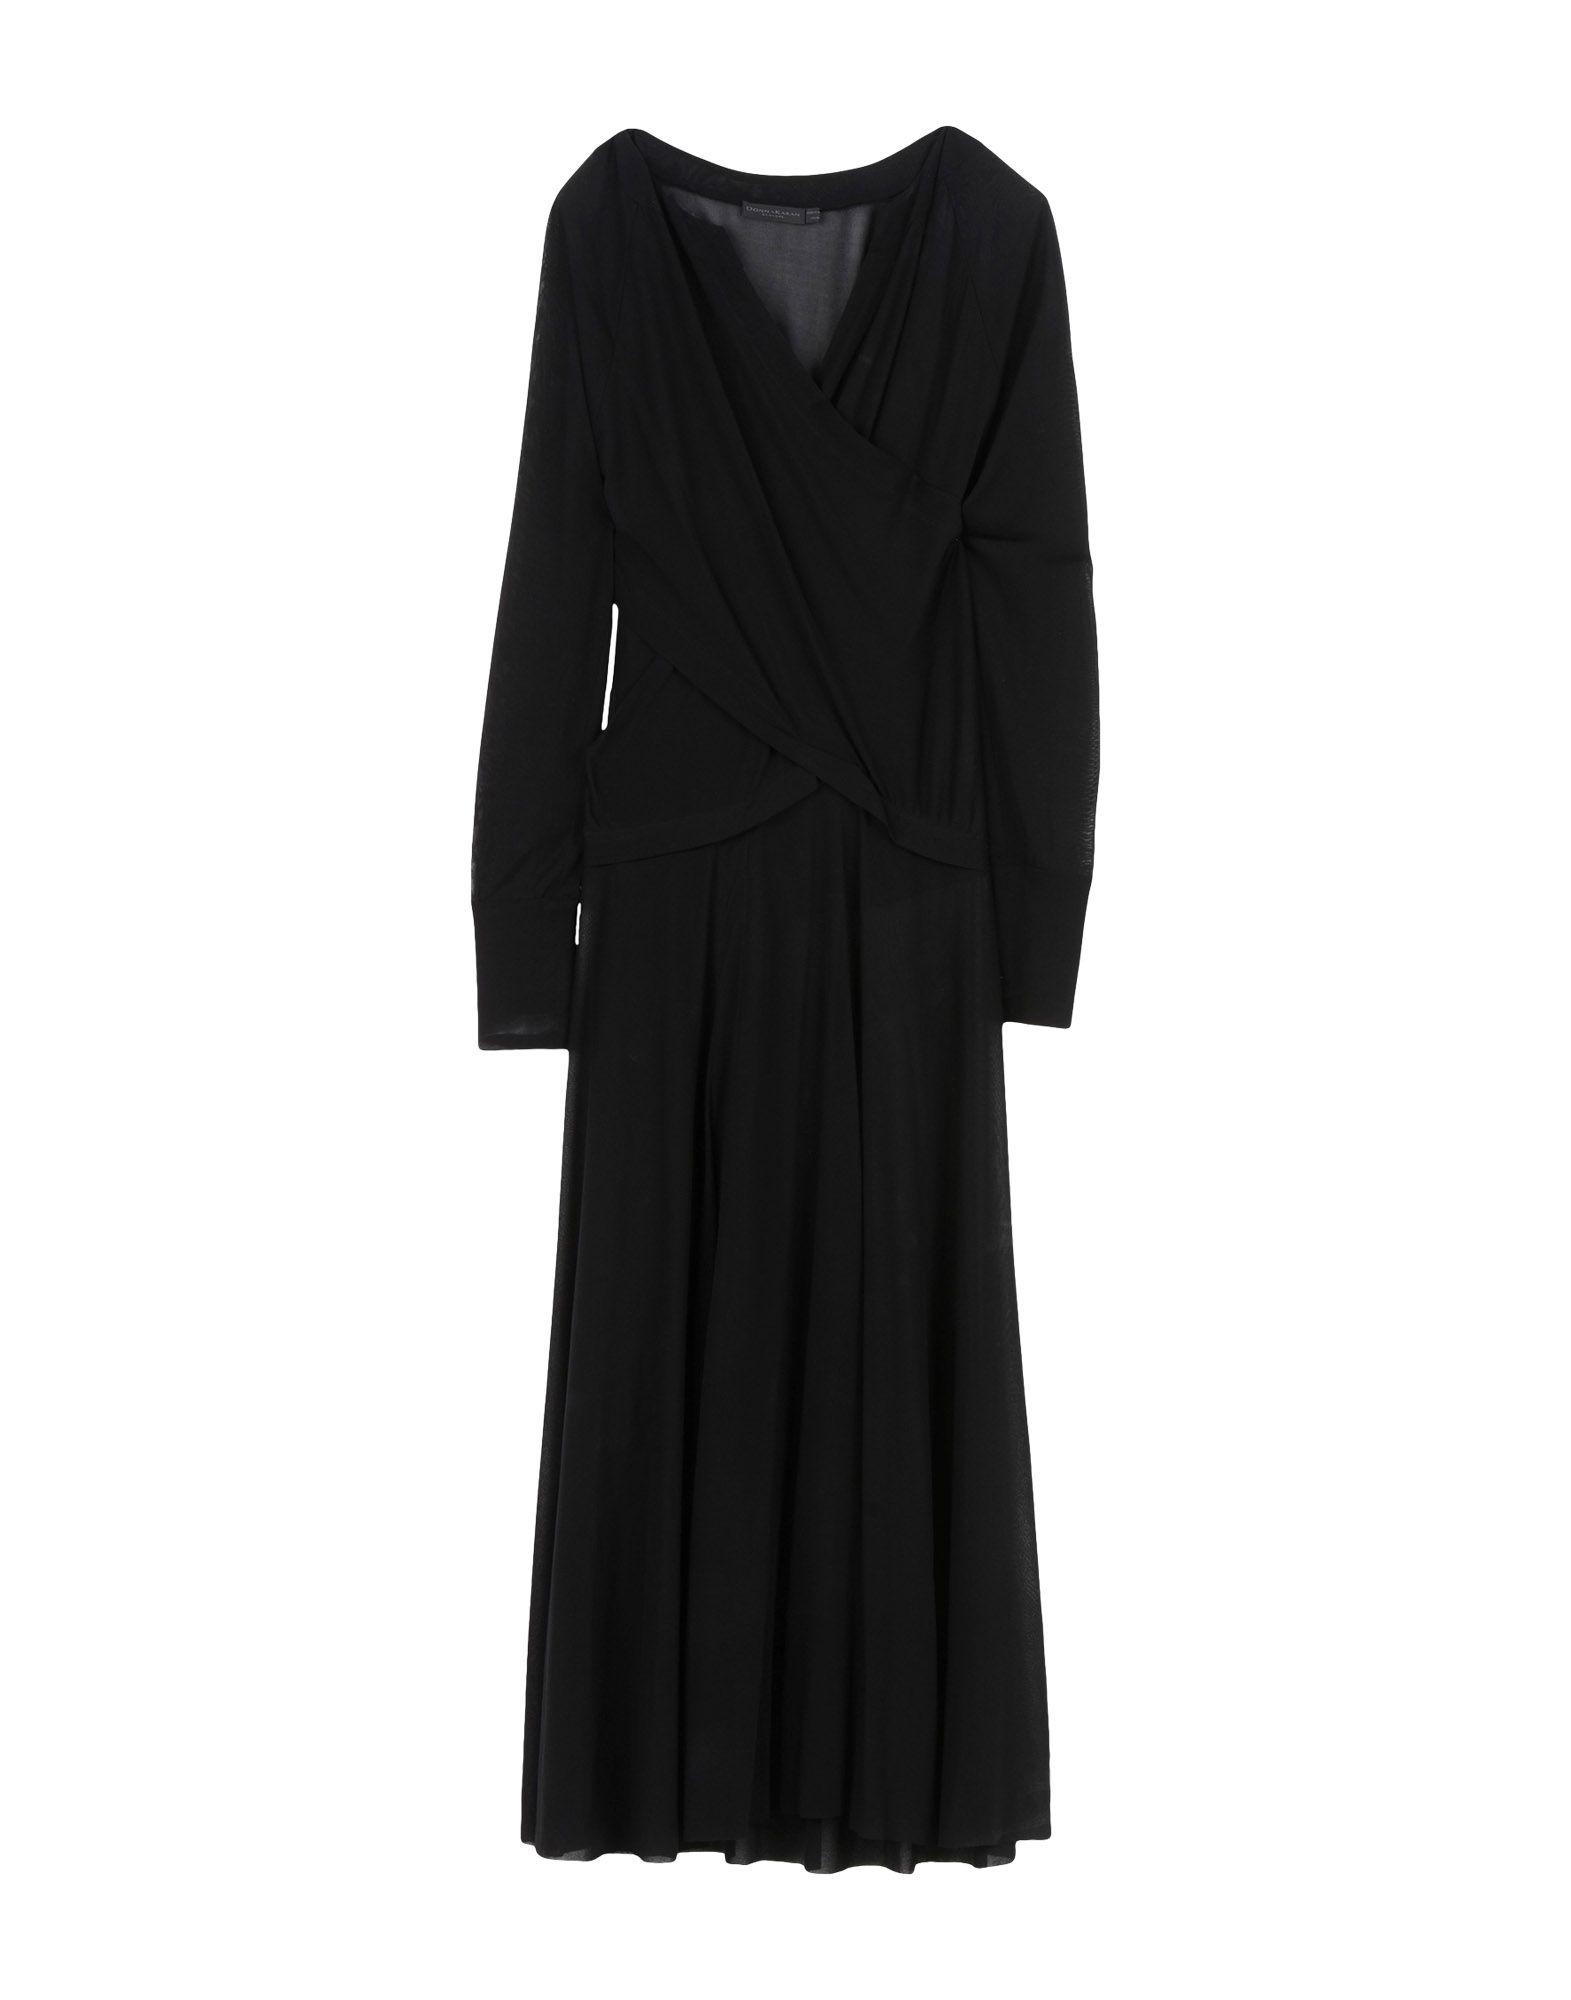 DONNA KARAN Платье длиной 3/4 tenax платье длиной 3 4